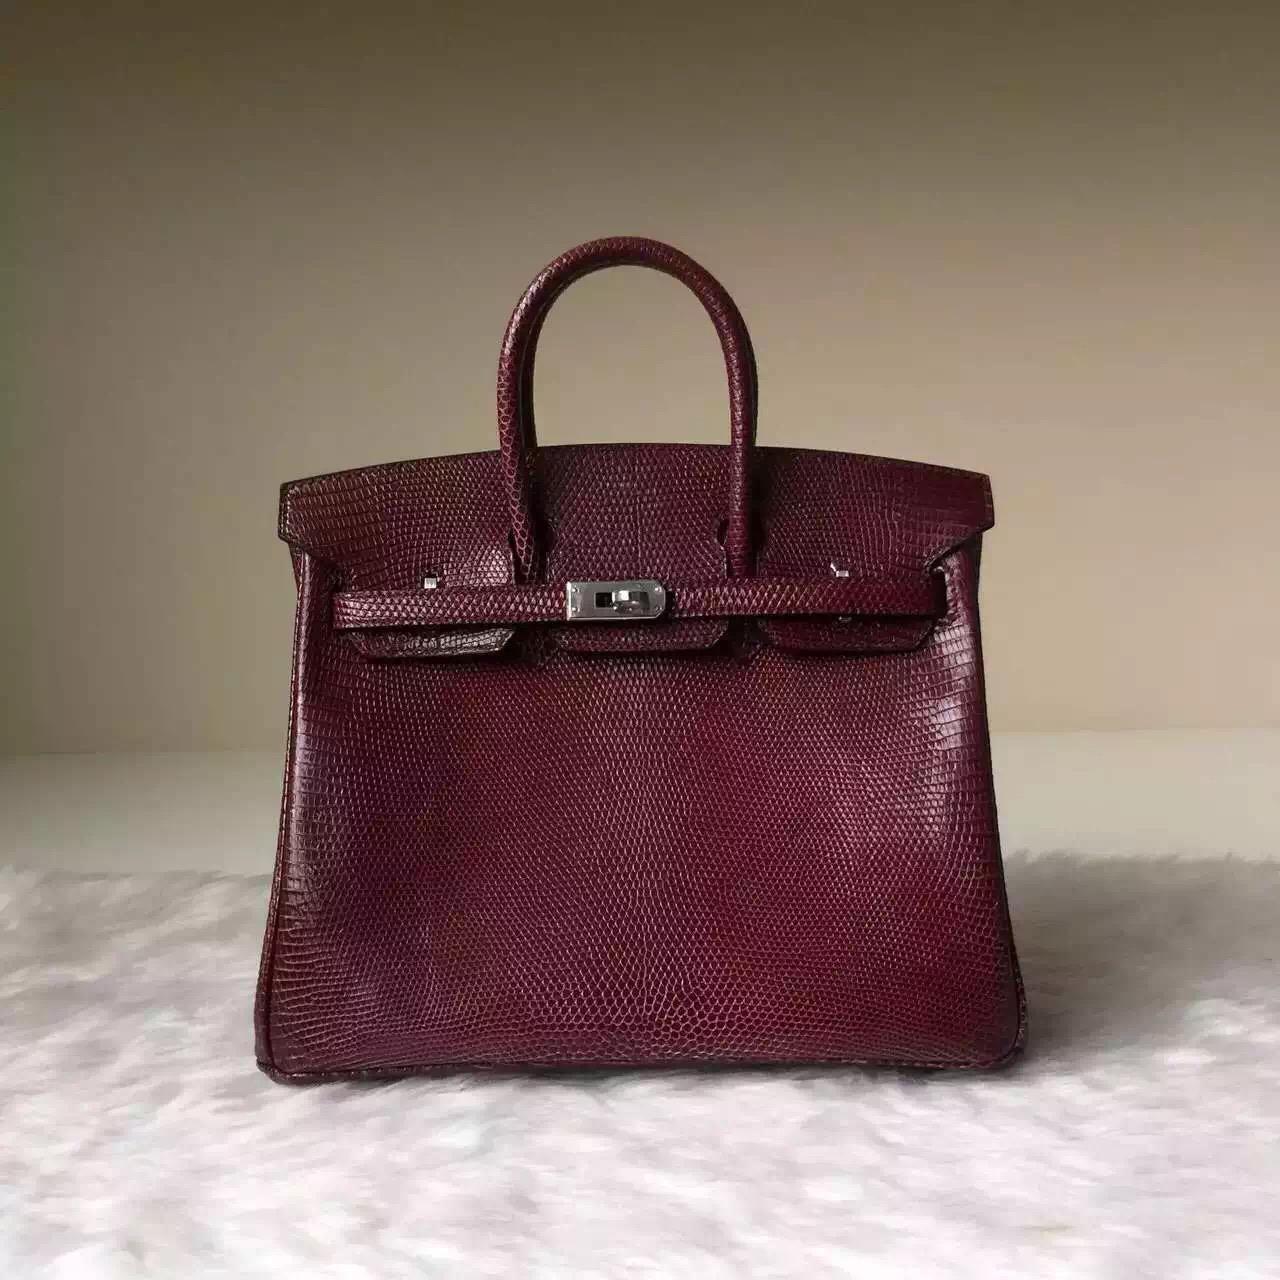 Wholesale Hermes Wine Red Lizard Skin Birkin Bag 25cm